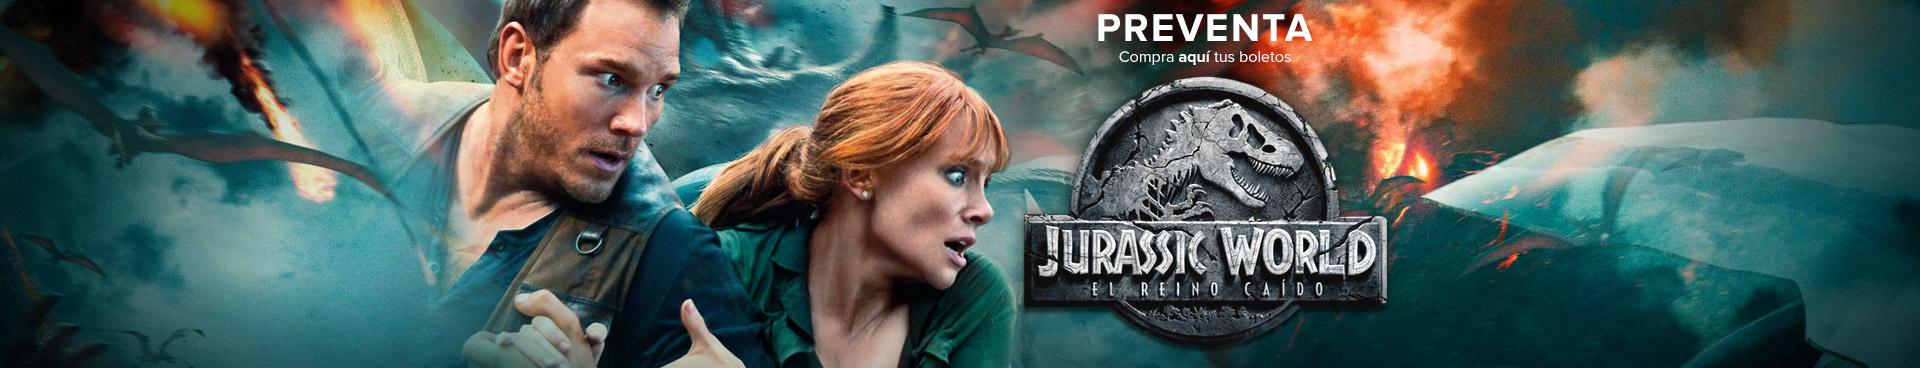 Preventa Jurassic World